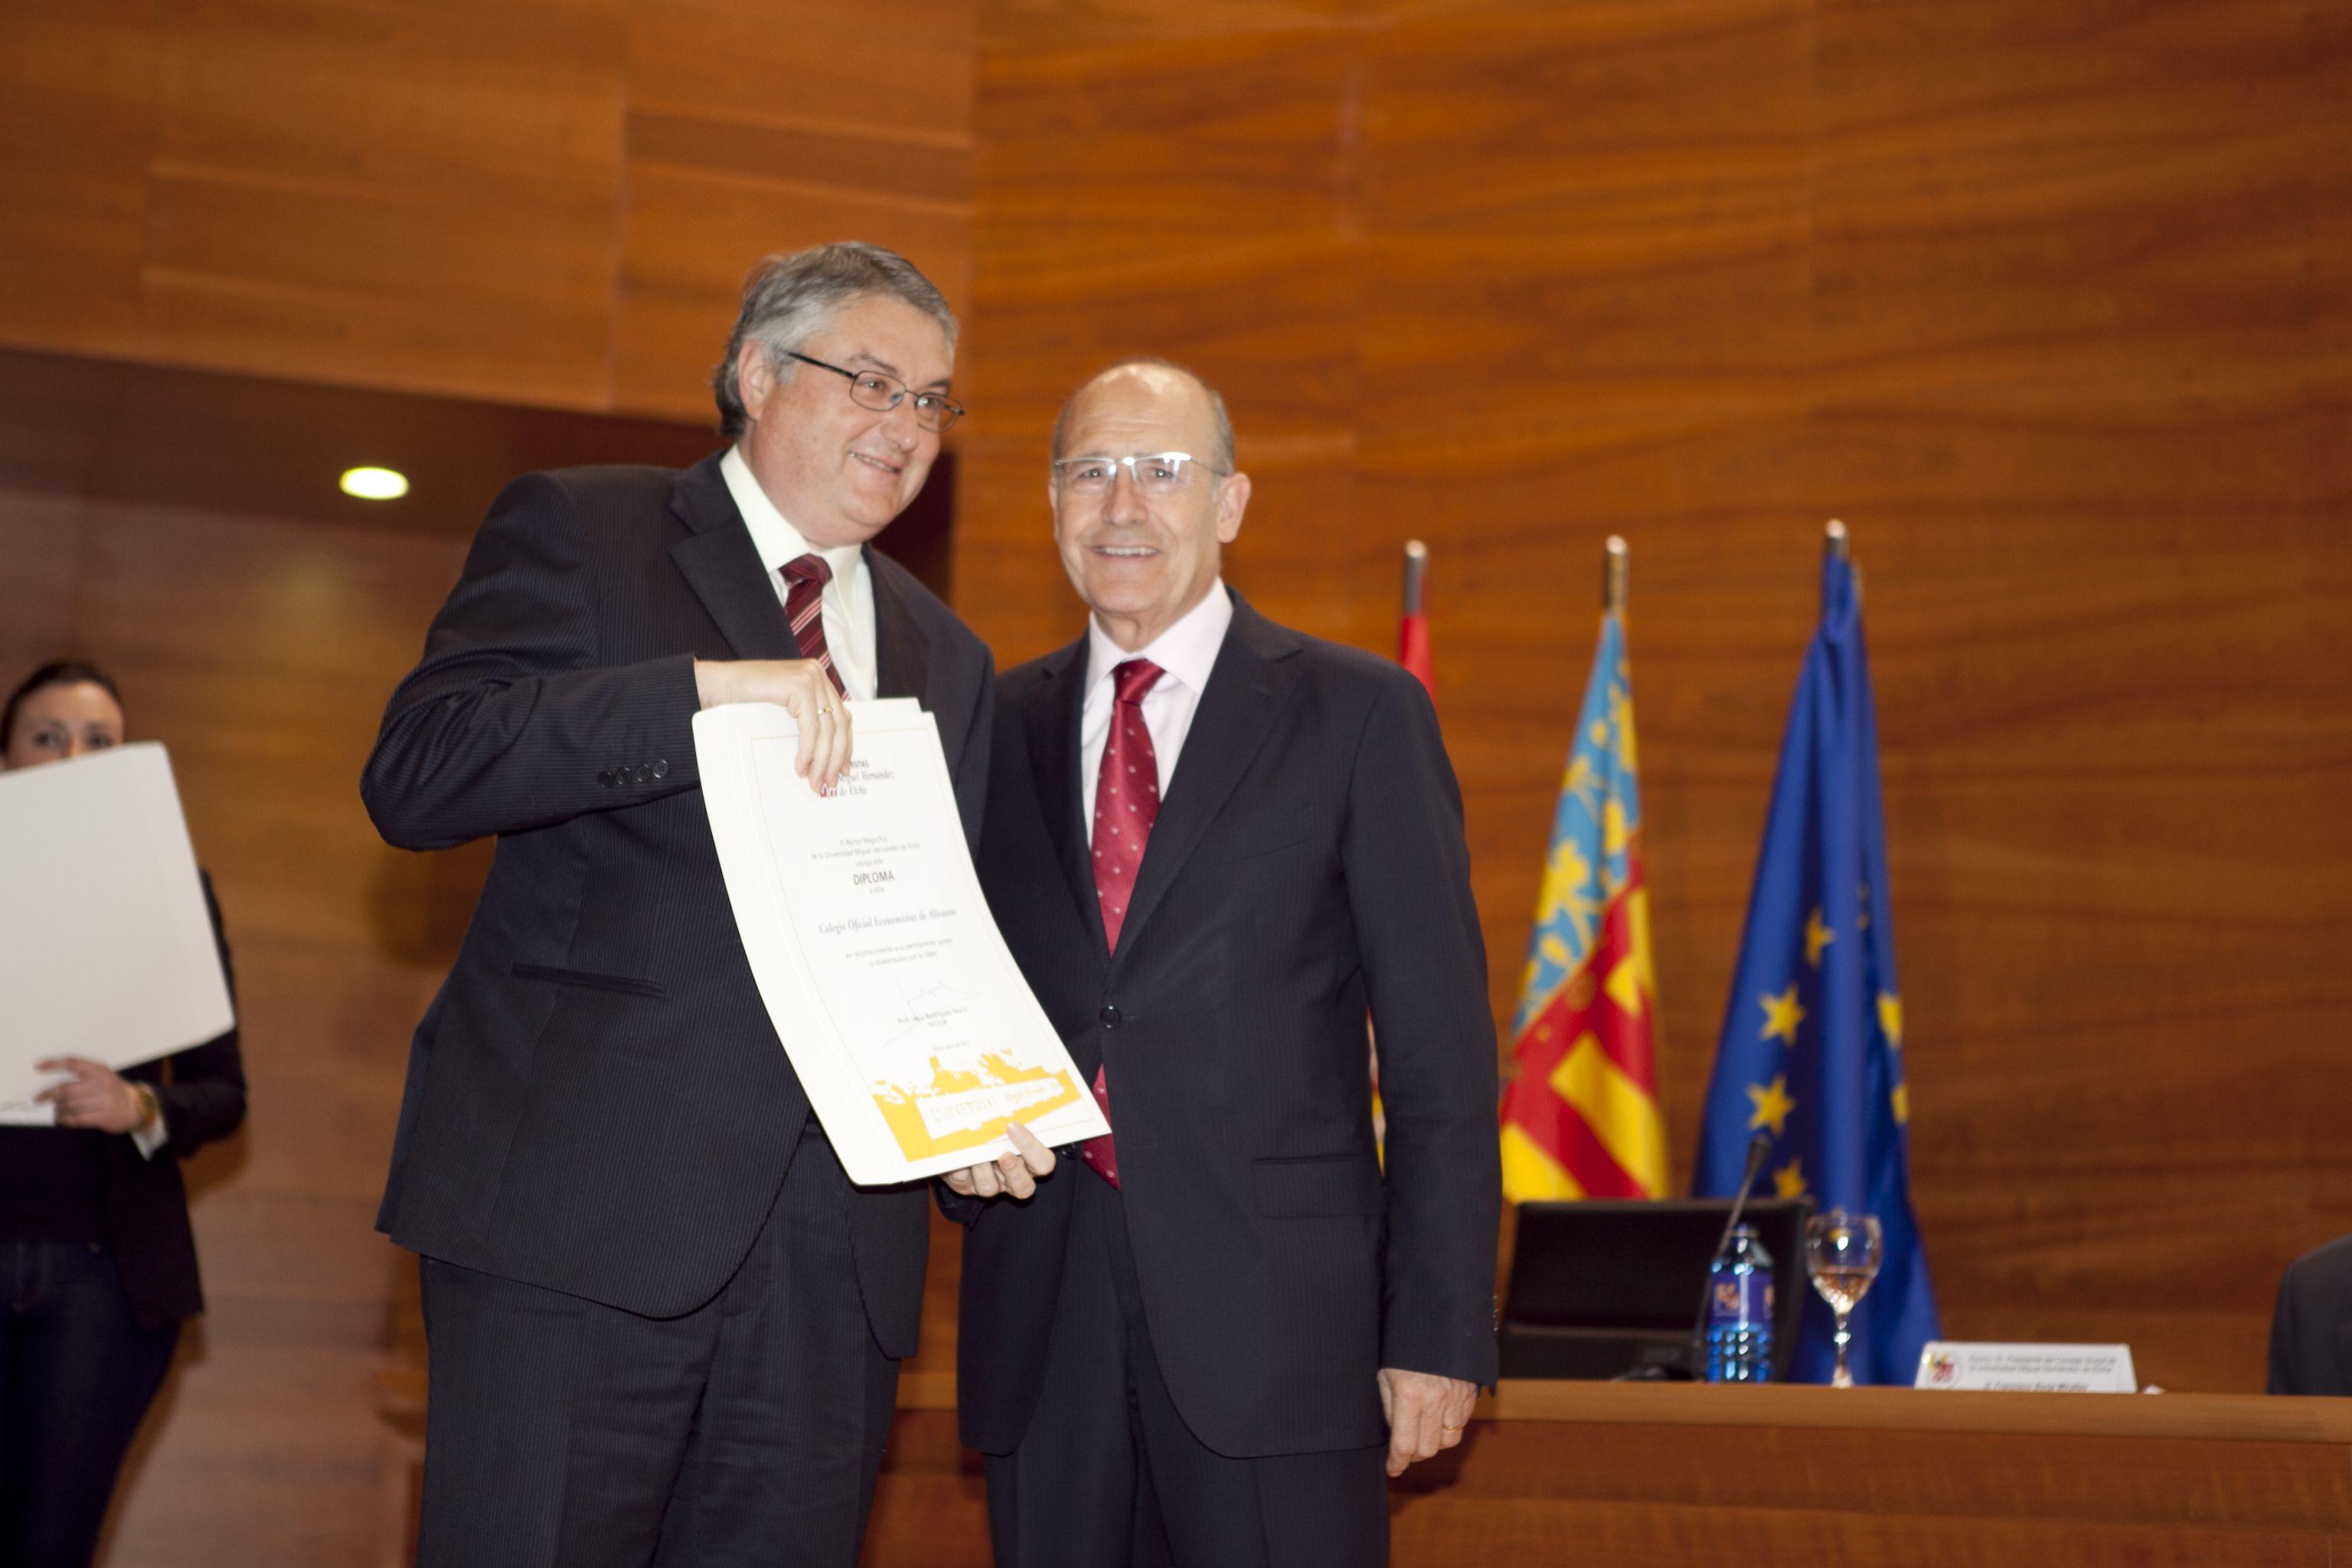 umh-diplomas-rector_mg_6899.jpg